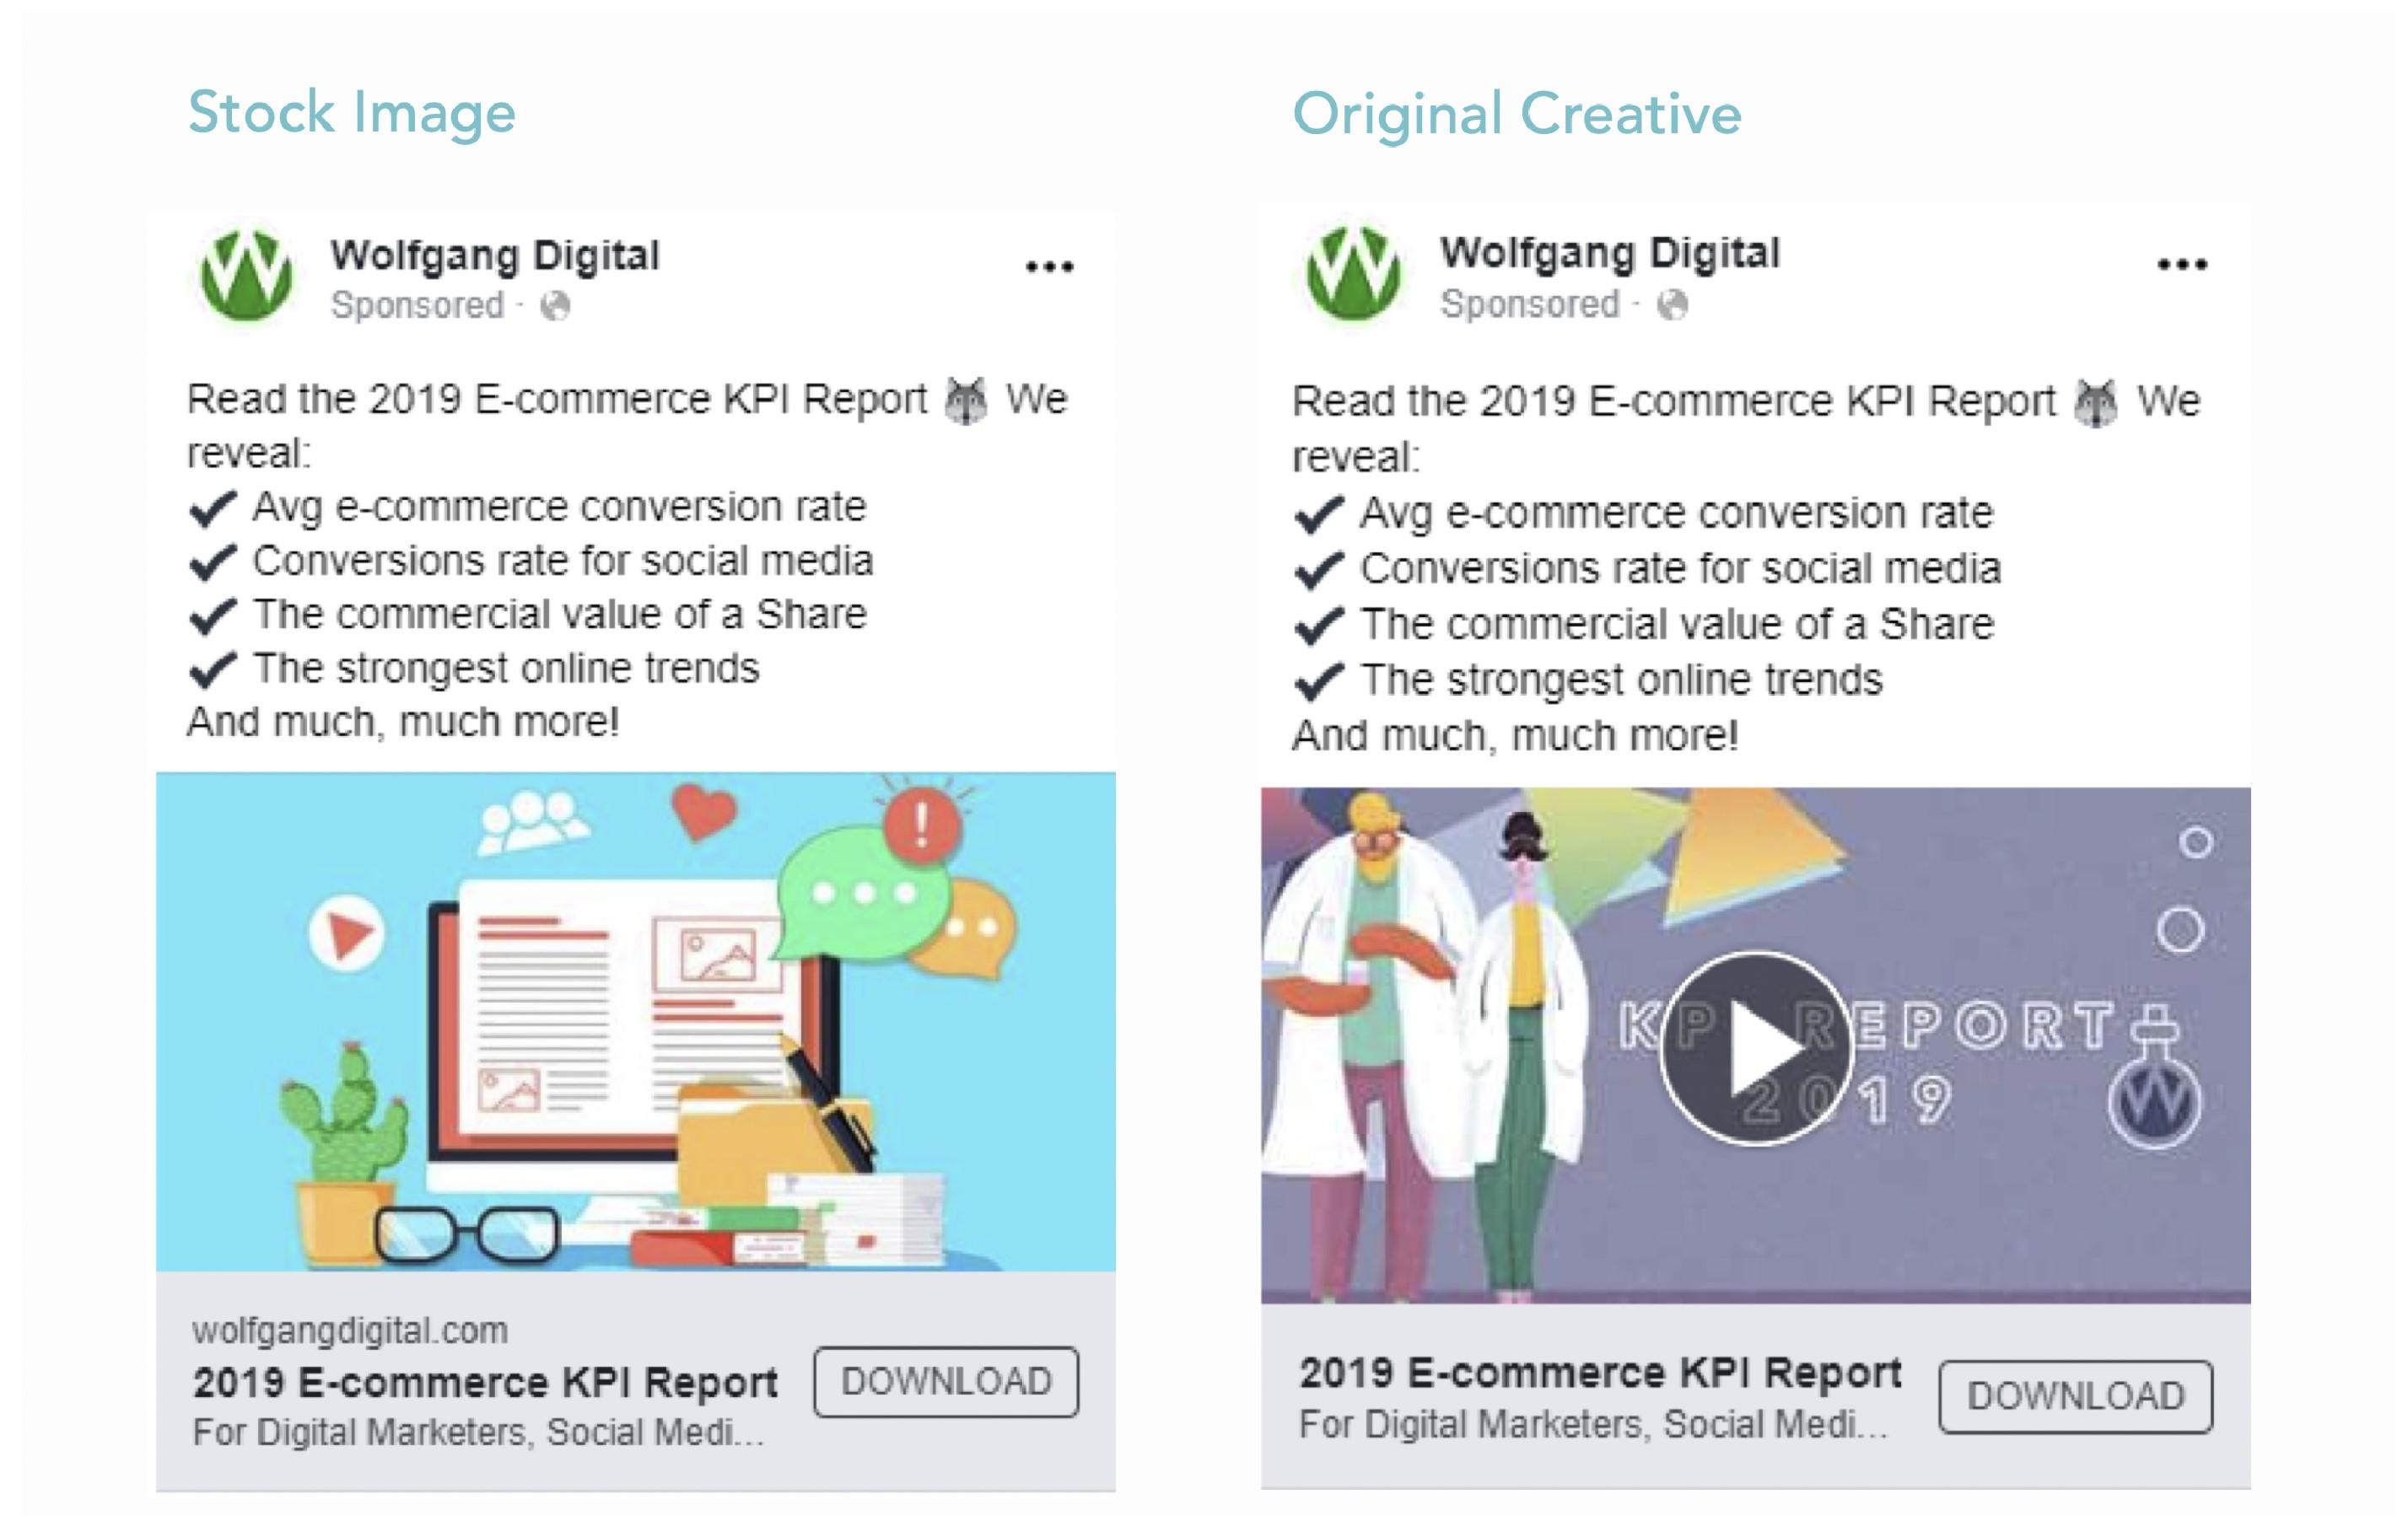 Custom versus stock creative